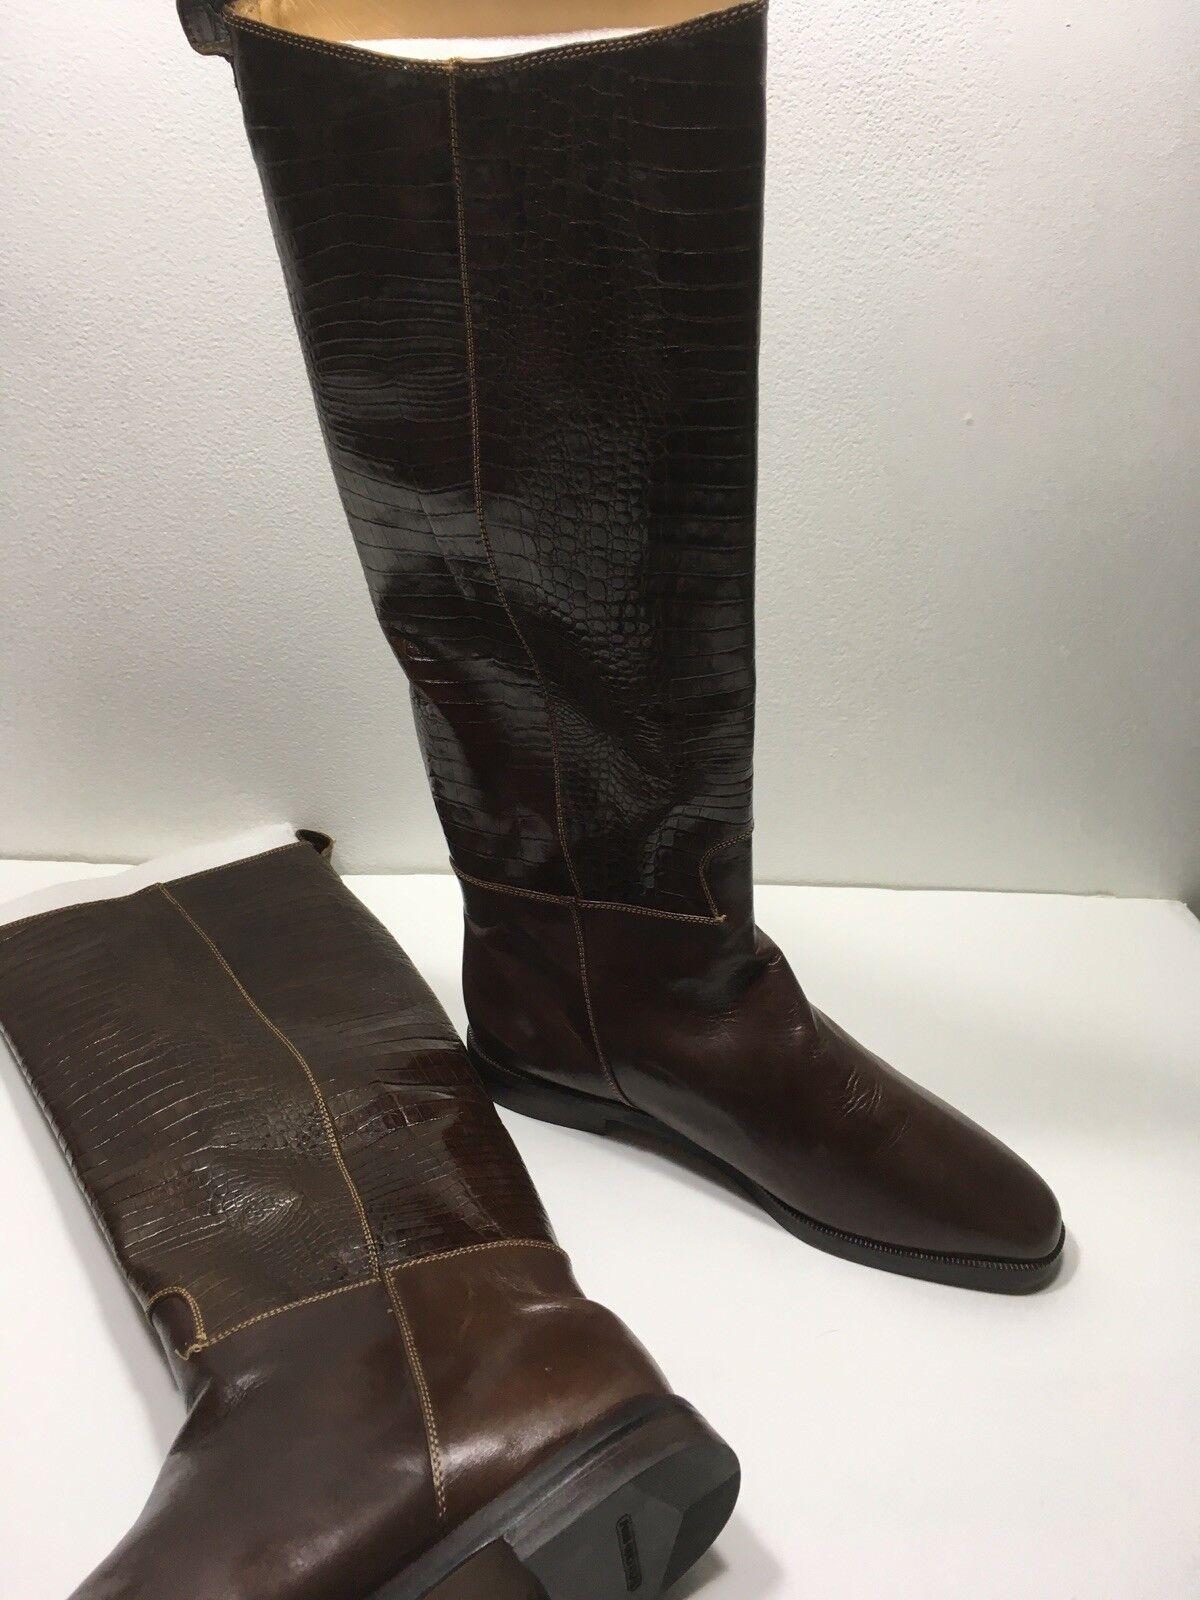 Pons  Quintana BOOTS    Tall Boots Crocodile Pint  Leather EU 39 bb2fc1